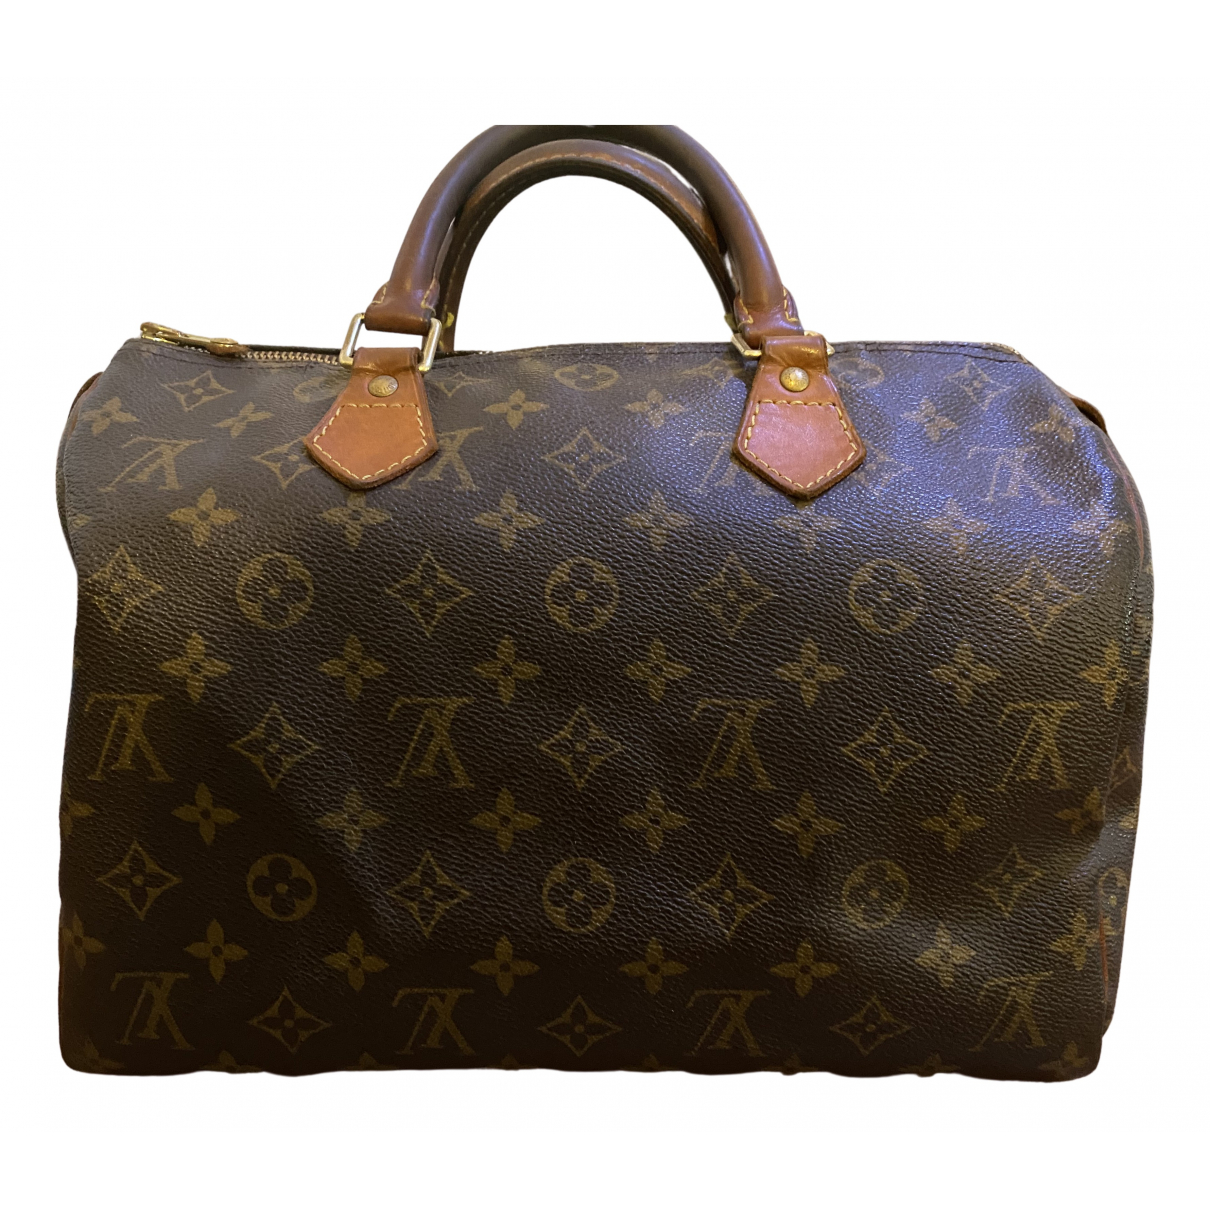 Louis Vuitton Speedy Brown Leather handbag for Women N